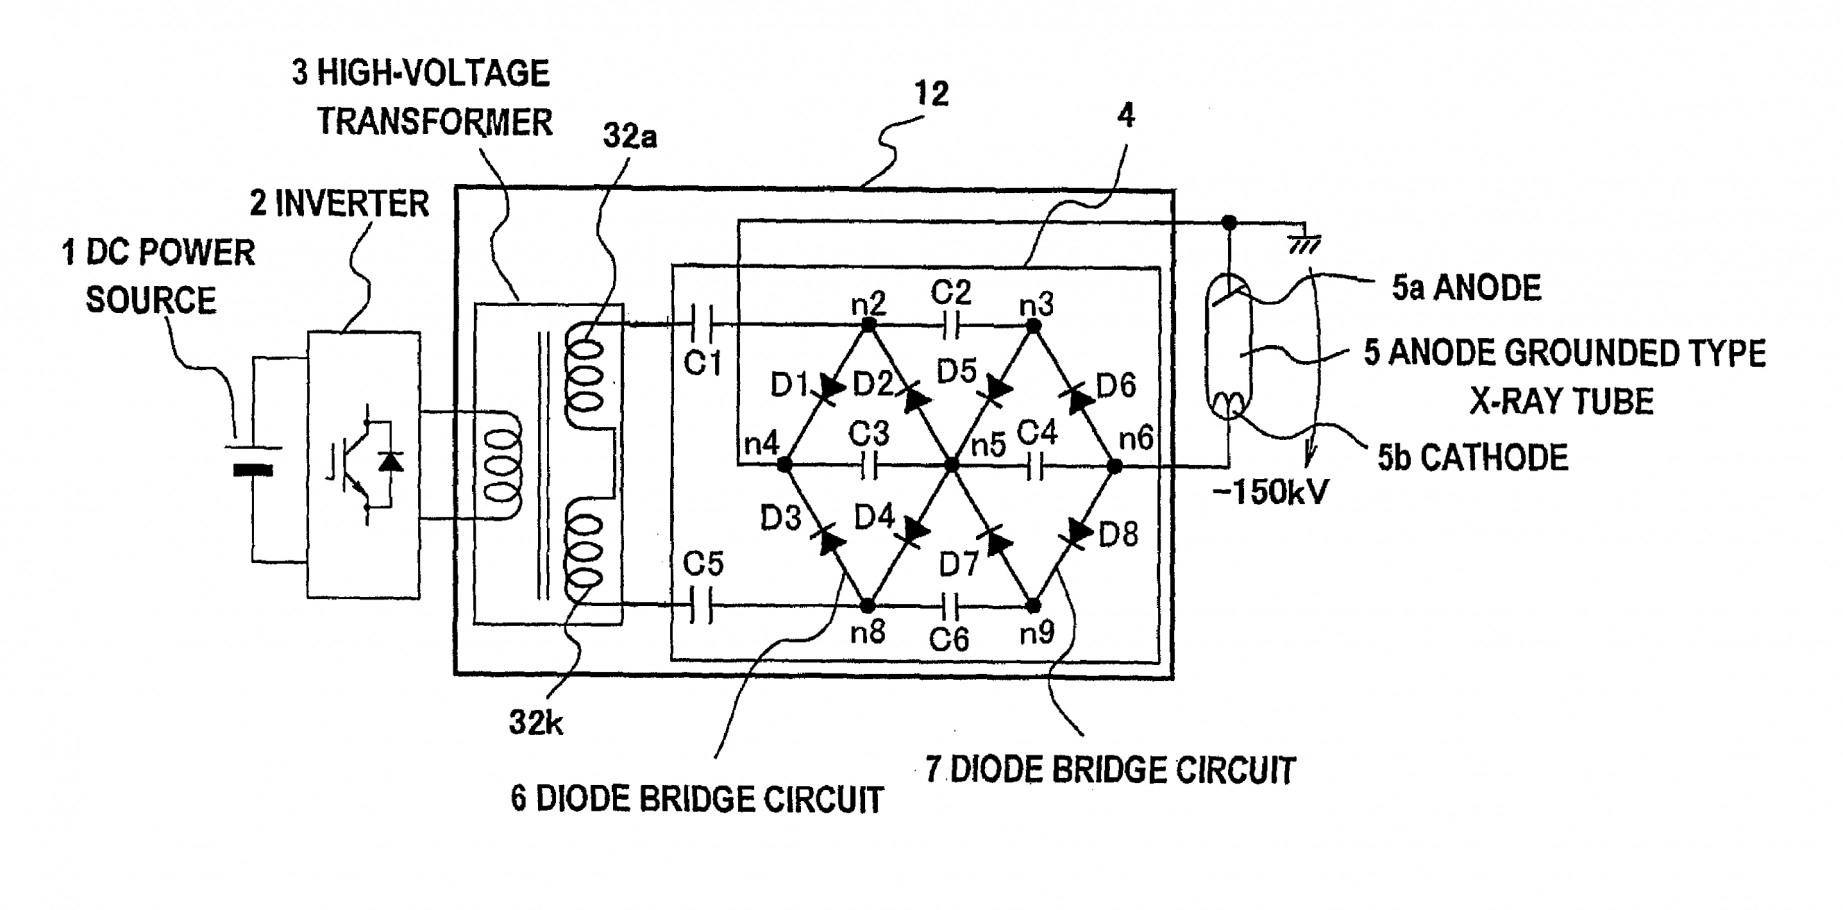 Progressive Dynamics Power Converter Wiring Diagram from 2020cadillac.com